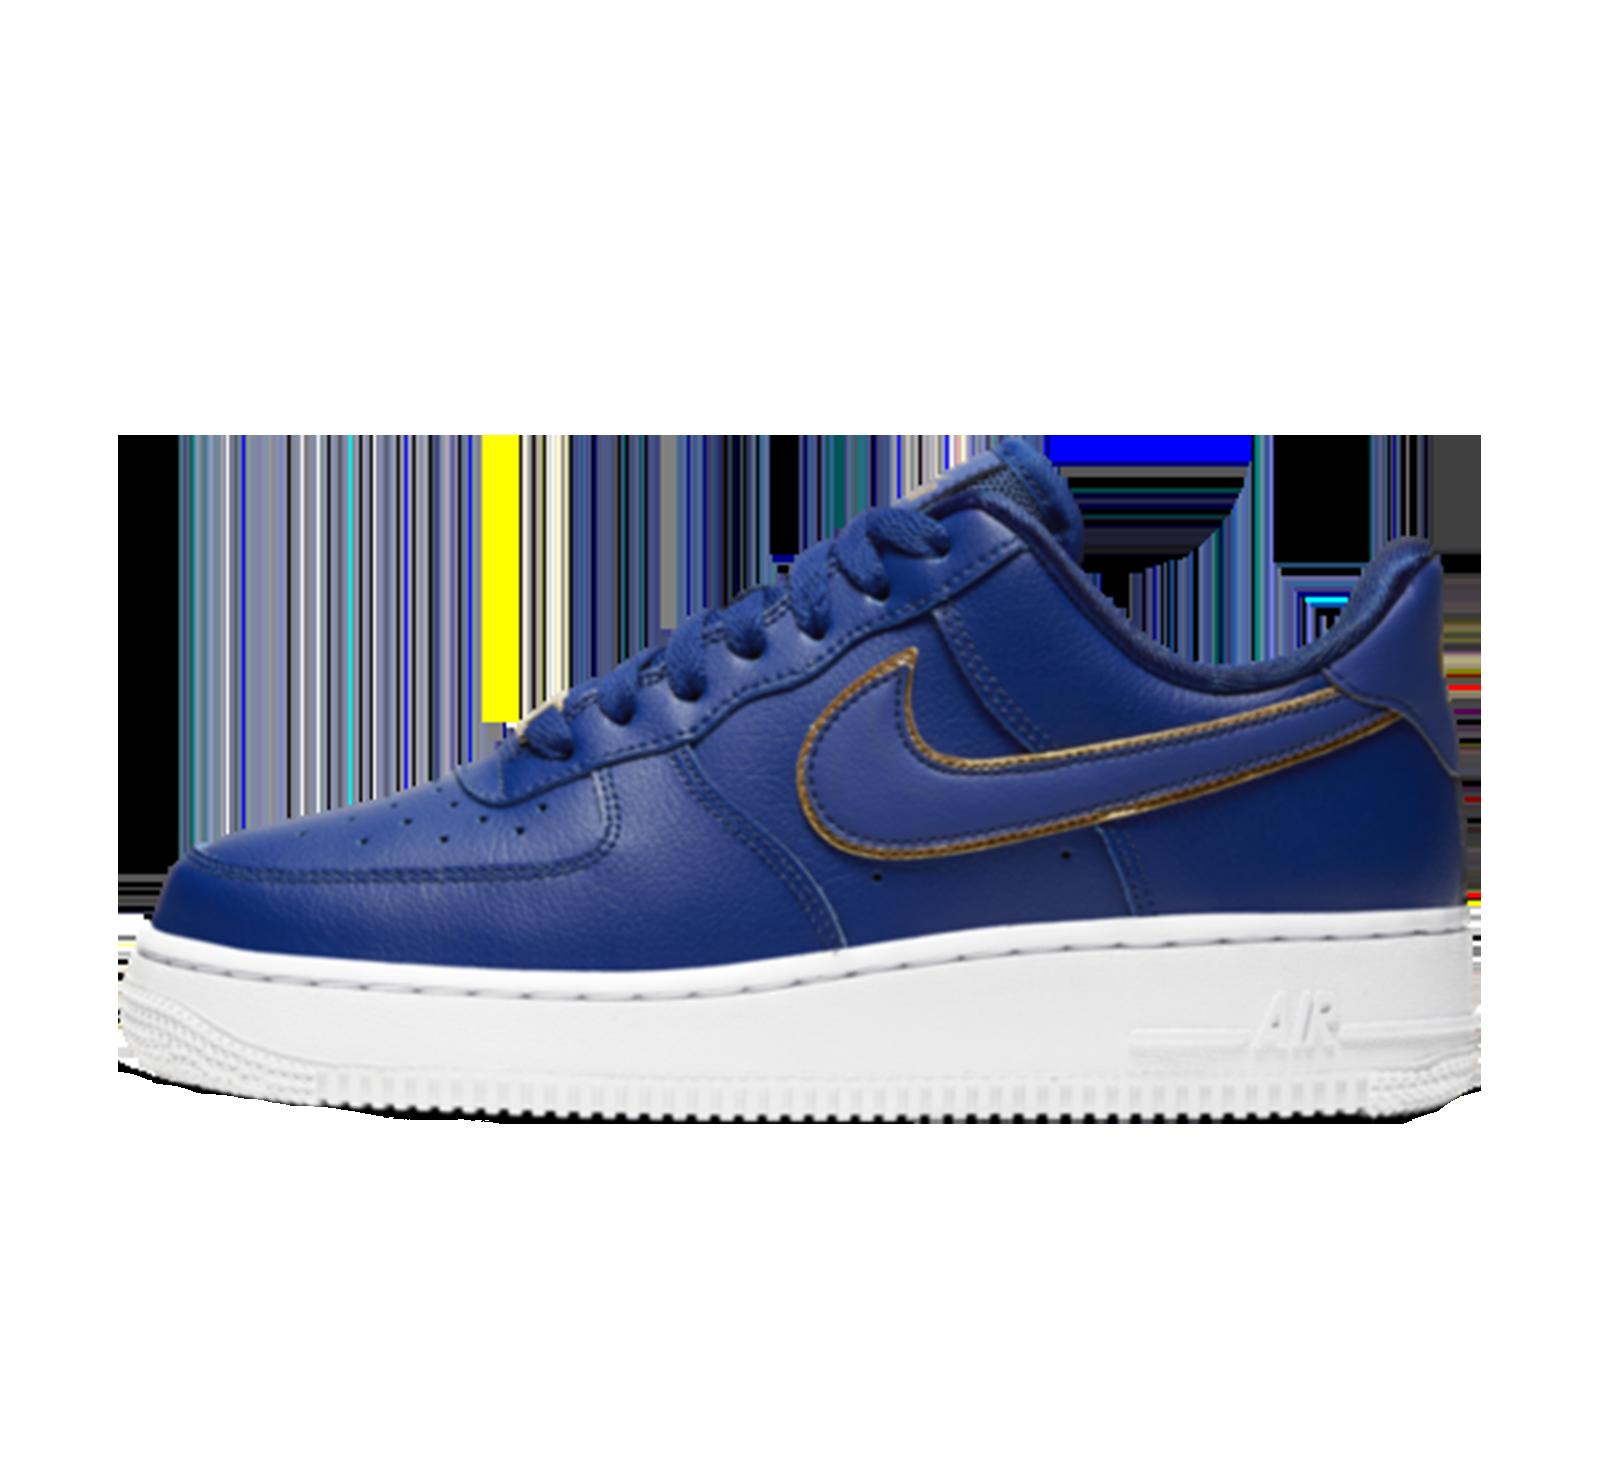 heiß Nike Air Force 1 '07 Essential Deep Royal BlueWhite im